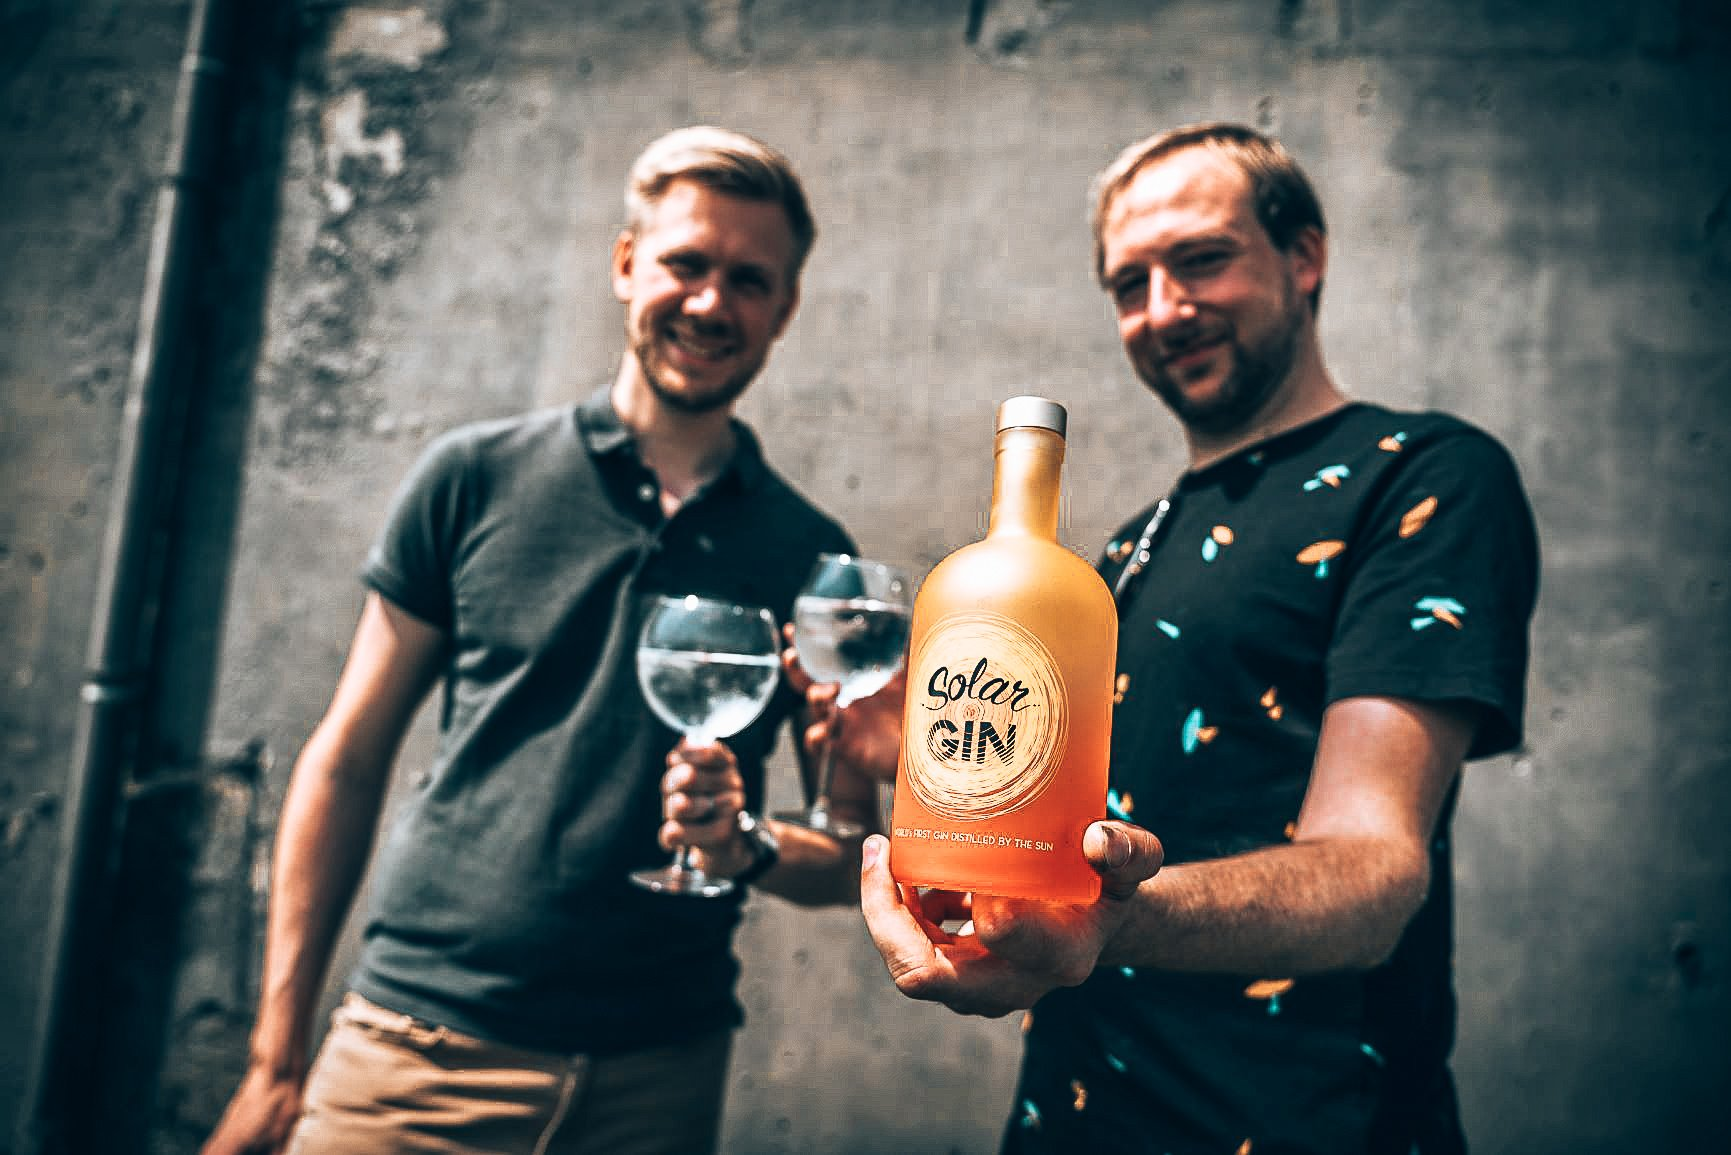 Founder Kevin van der Merlen met Solar Gin, Alles over gin.